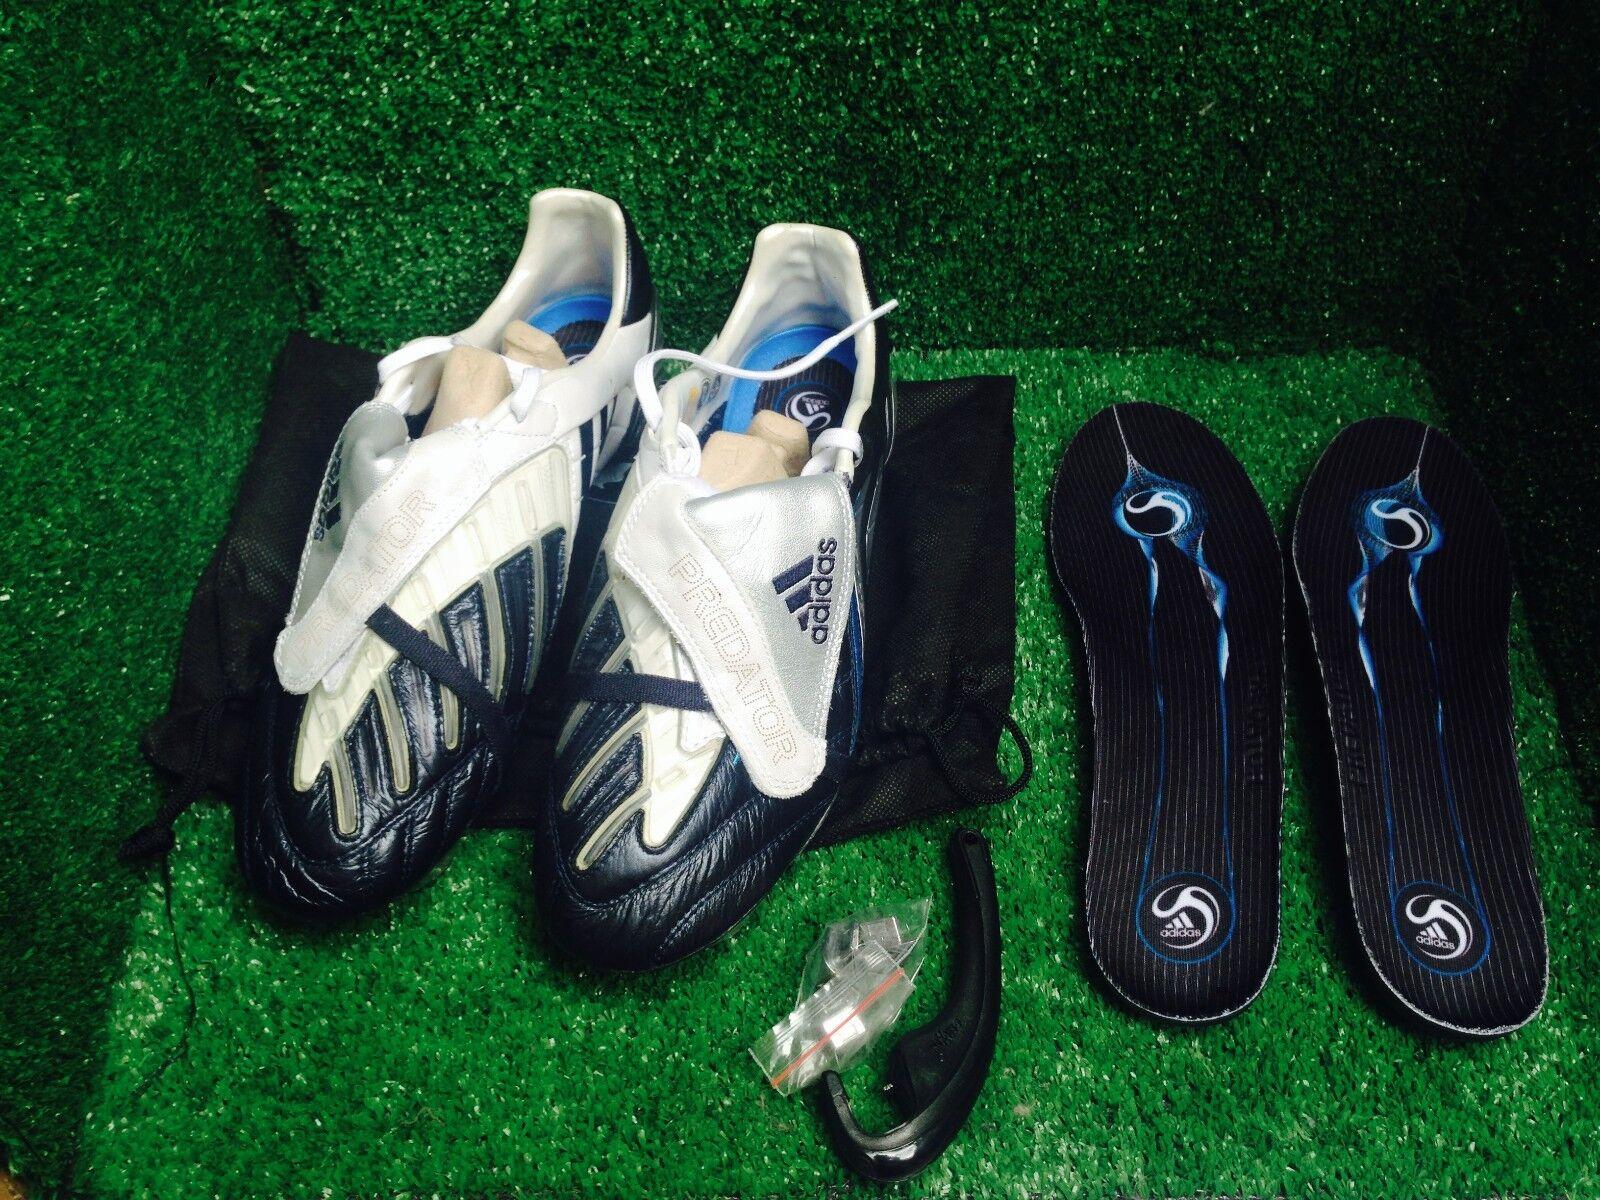 Adidas Prossoator energiaswerve CL F50 spider Dimensione 7,5 8 41 bianca blu